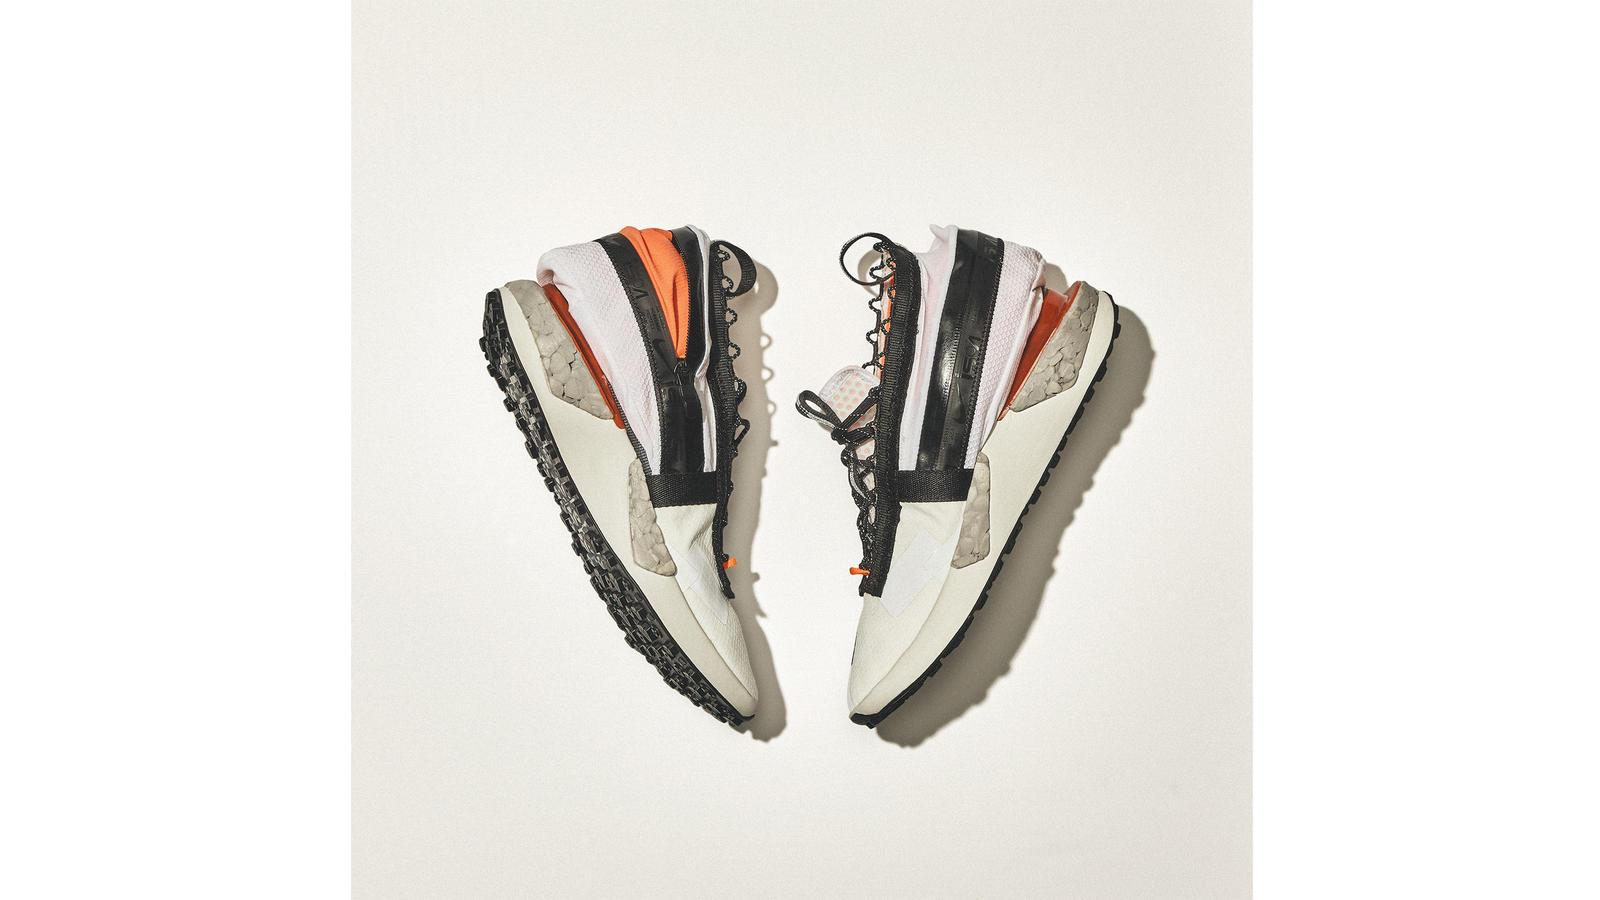 Nike ISPA Drifter Gator 6